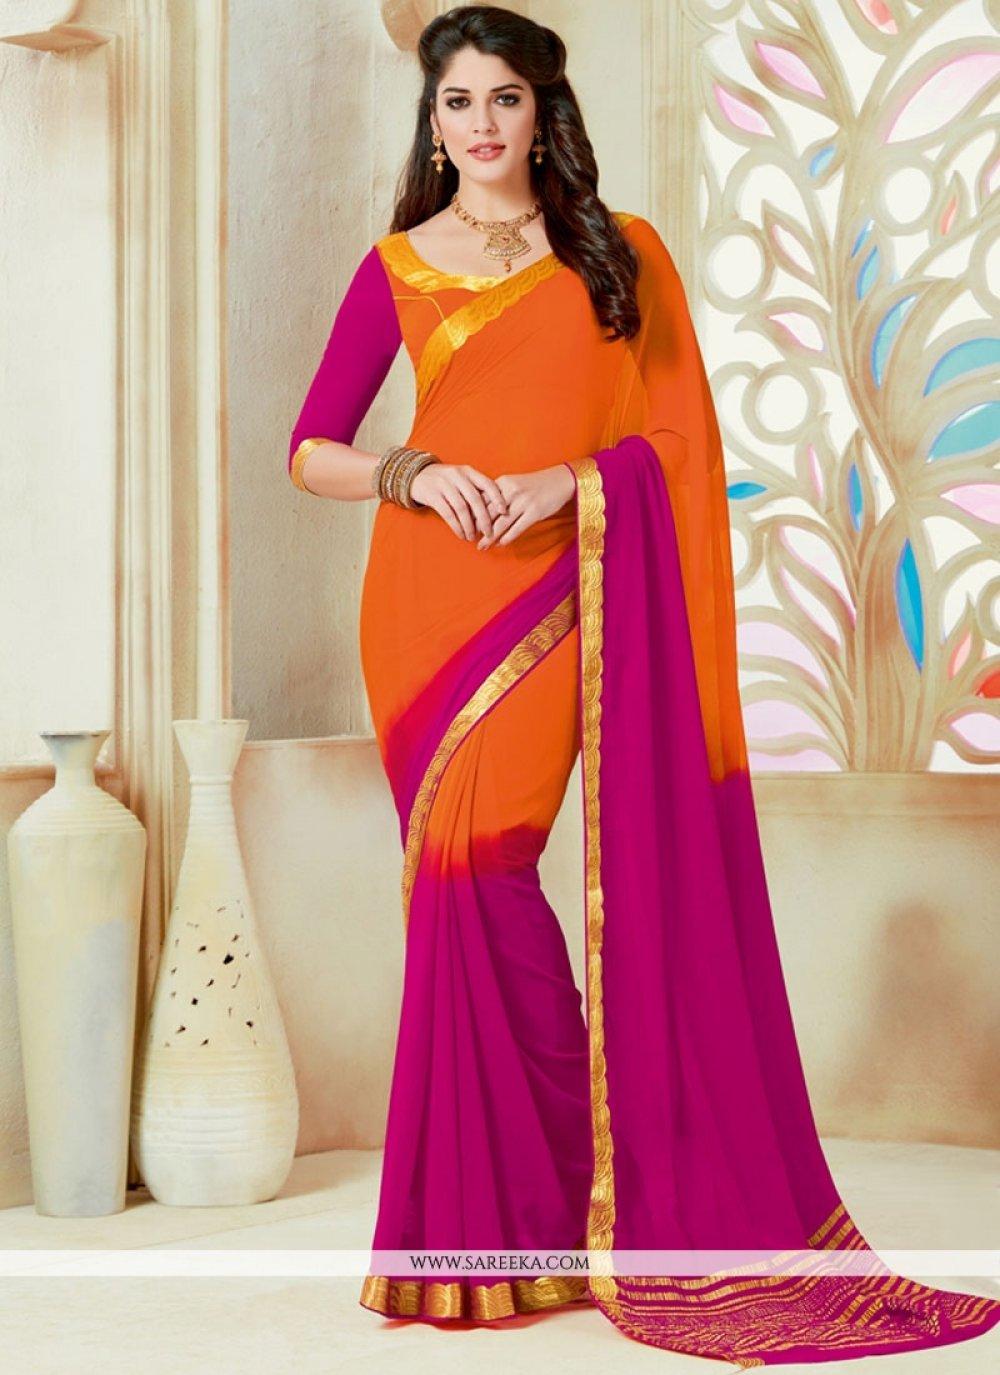 Hot Pink and Orange Lace Work Faux Chiffon Shaded Saree